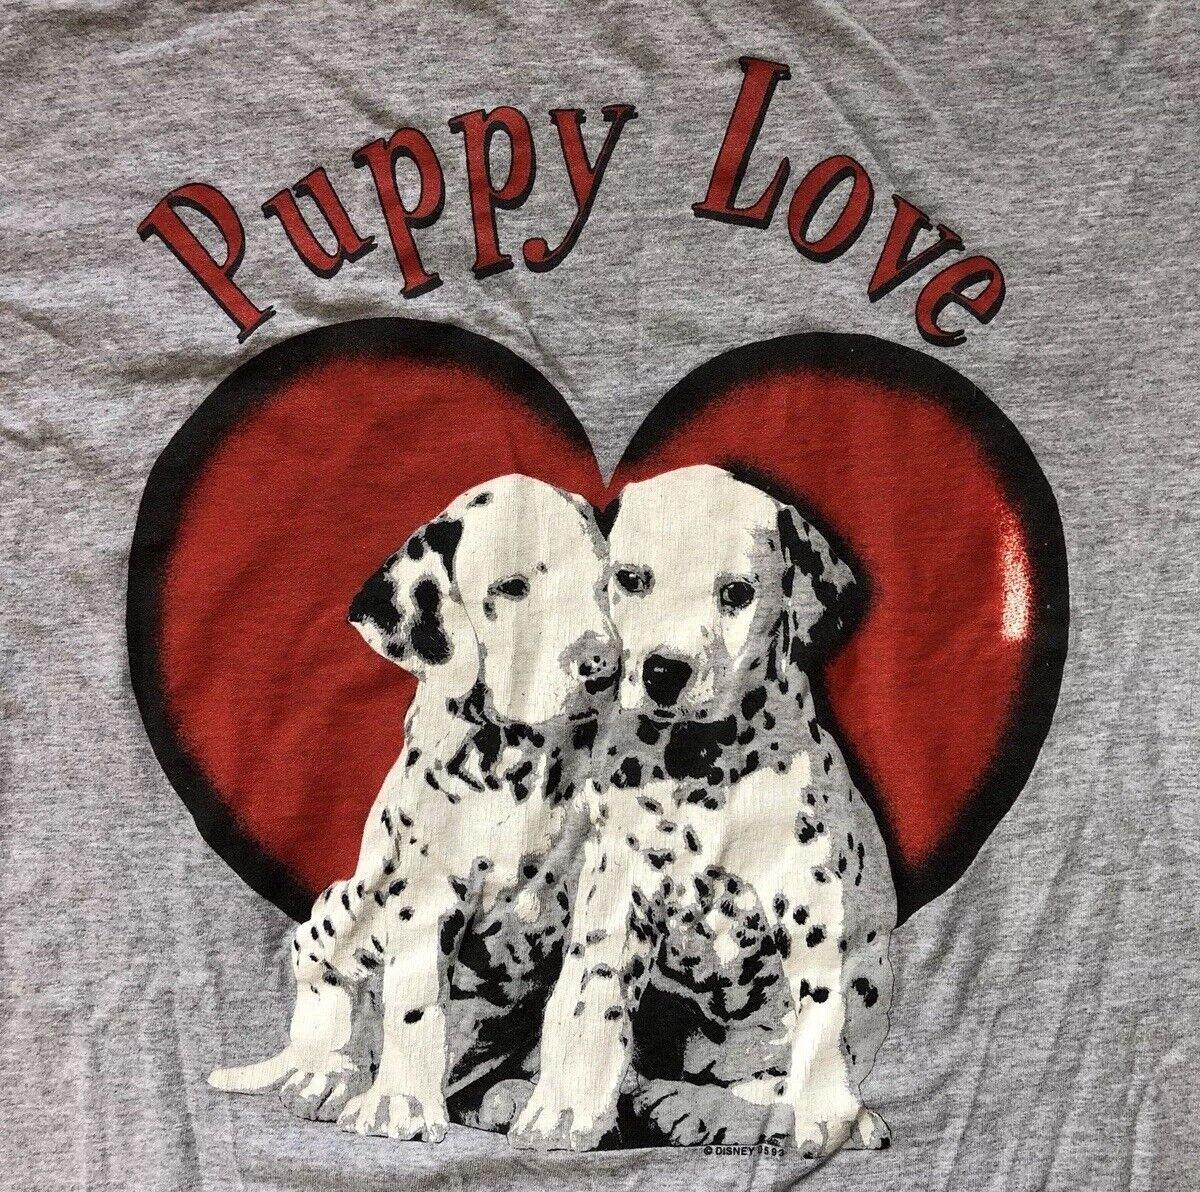 Vintage 1993 101 Dalmations Puppy Love L/xl Rare 90s Hip Hop Collectors Shirt